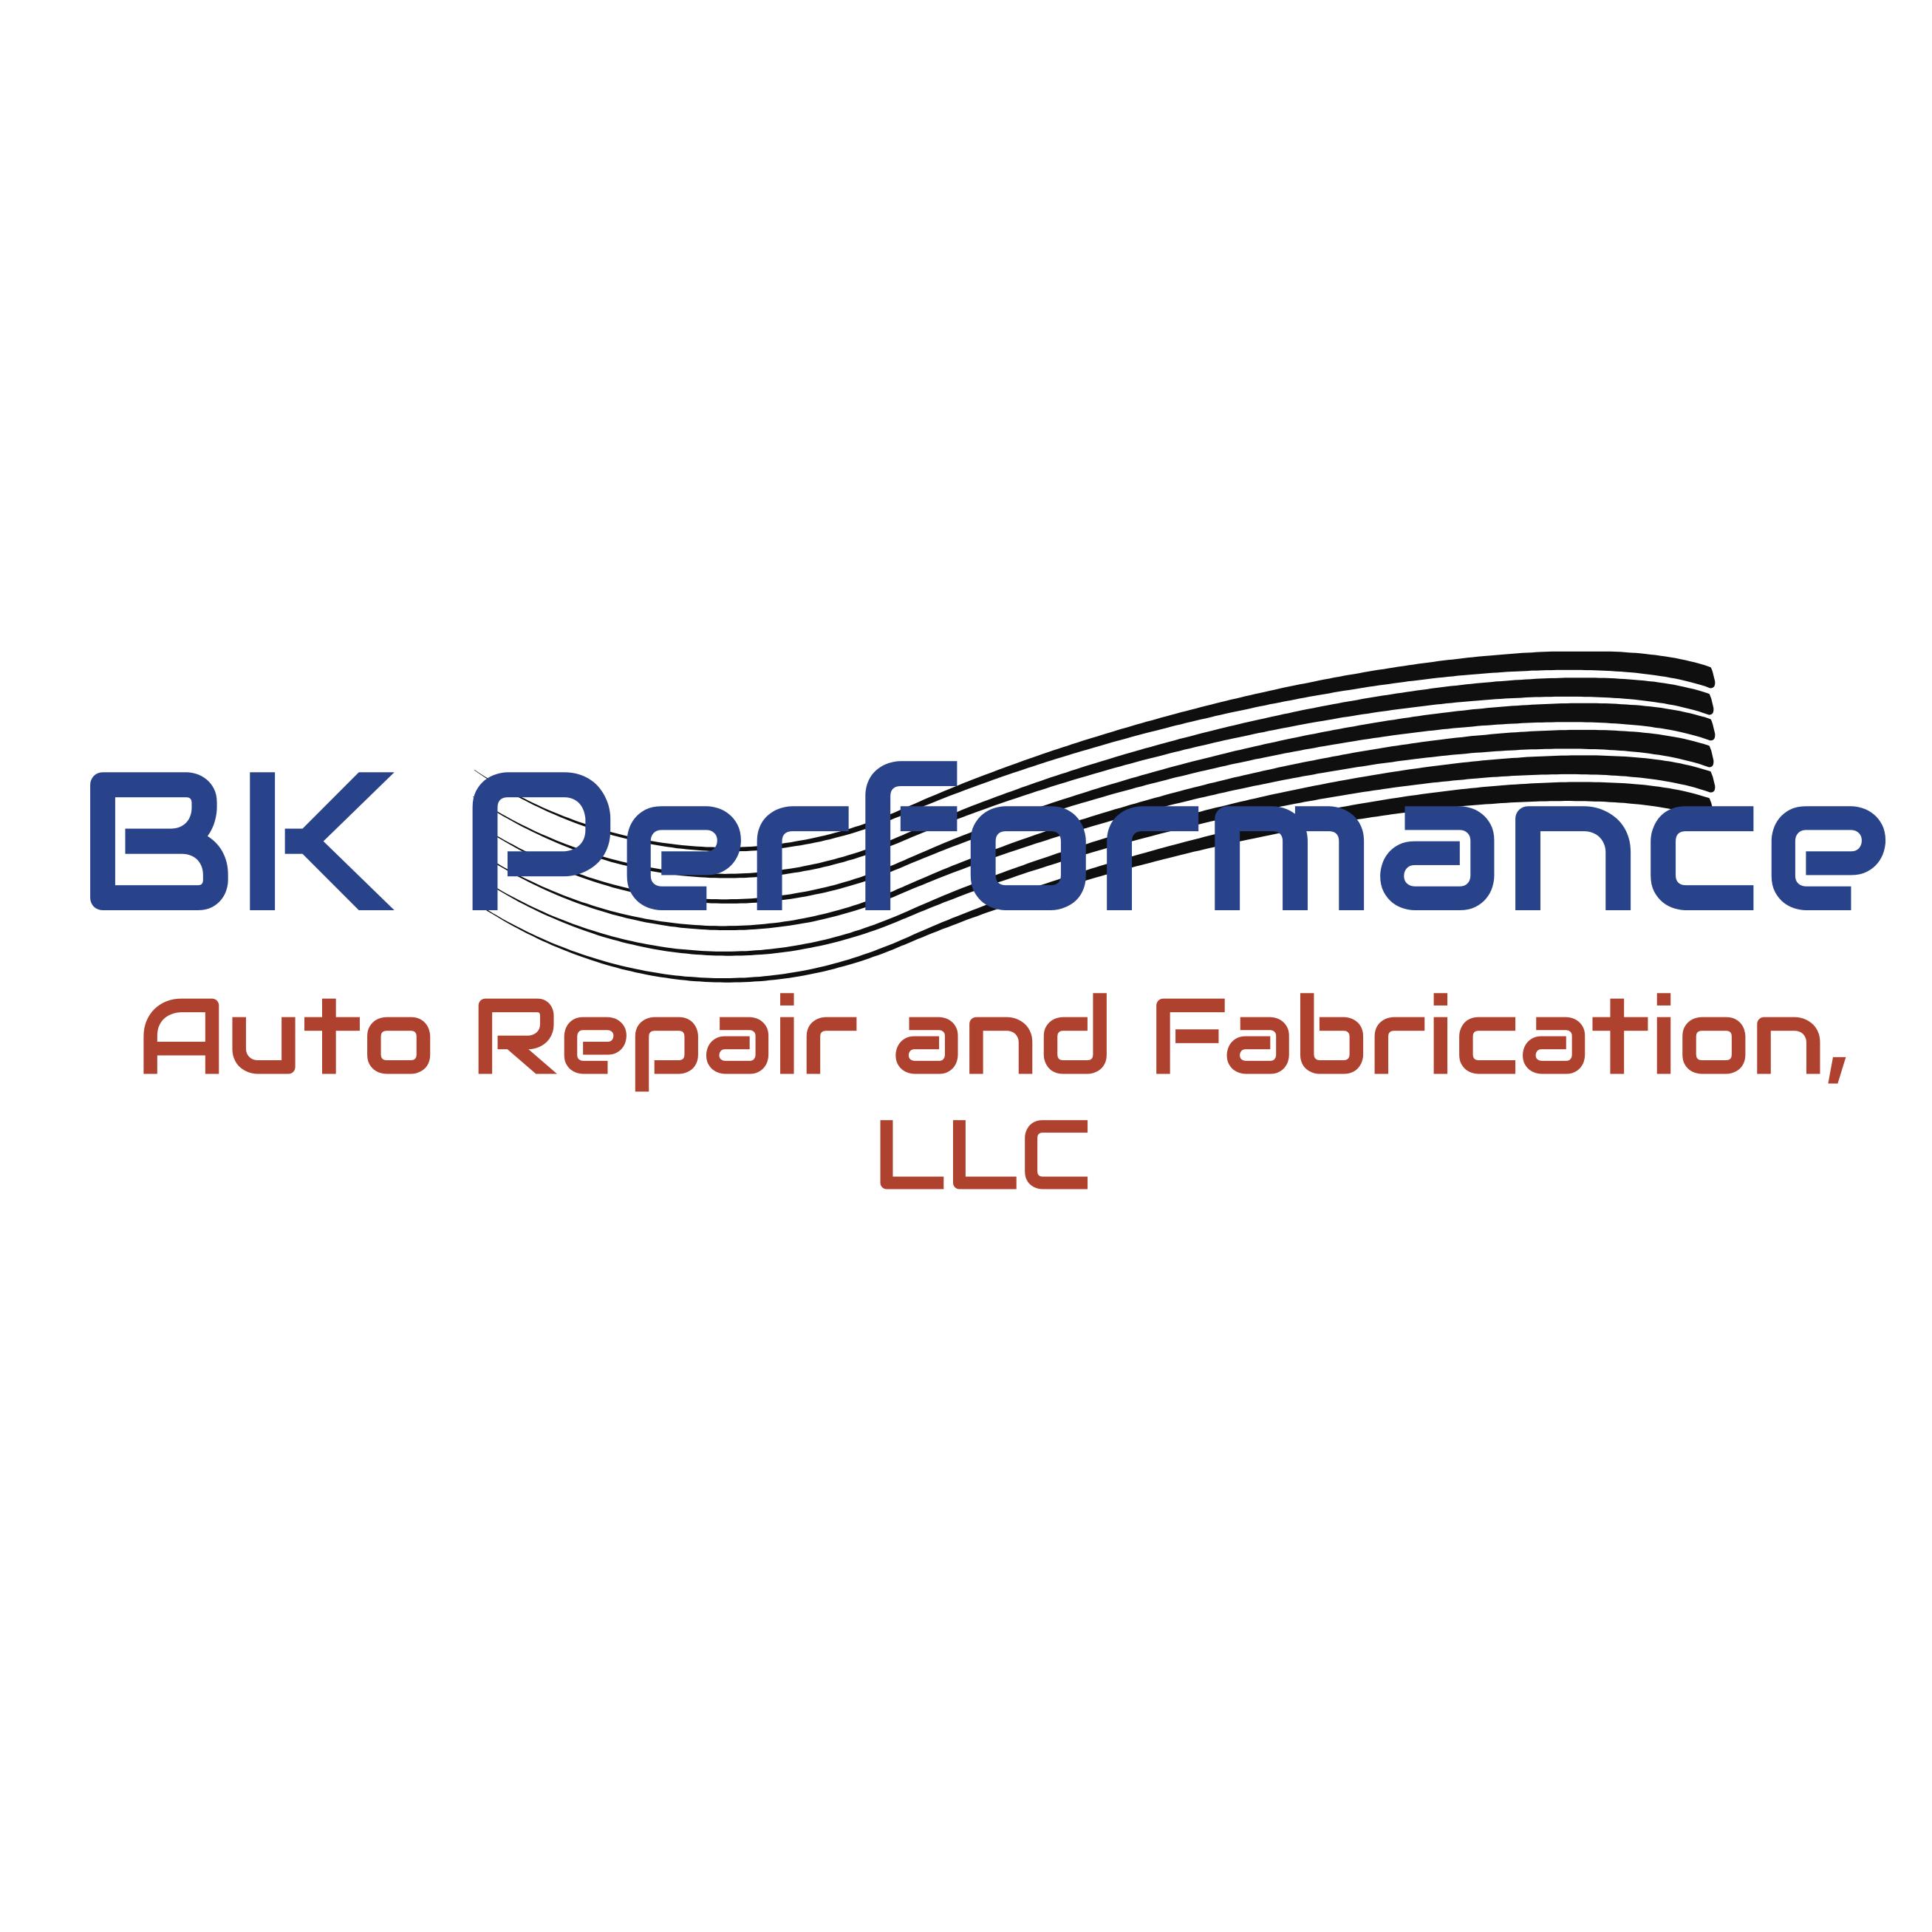 BK Performance Auto Repair and Fabrication, LLC